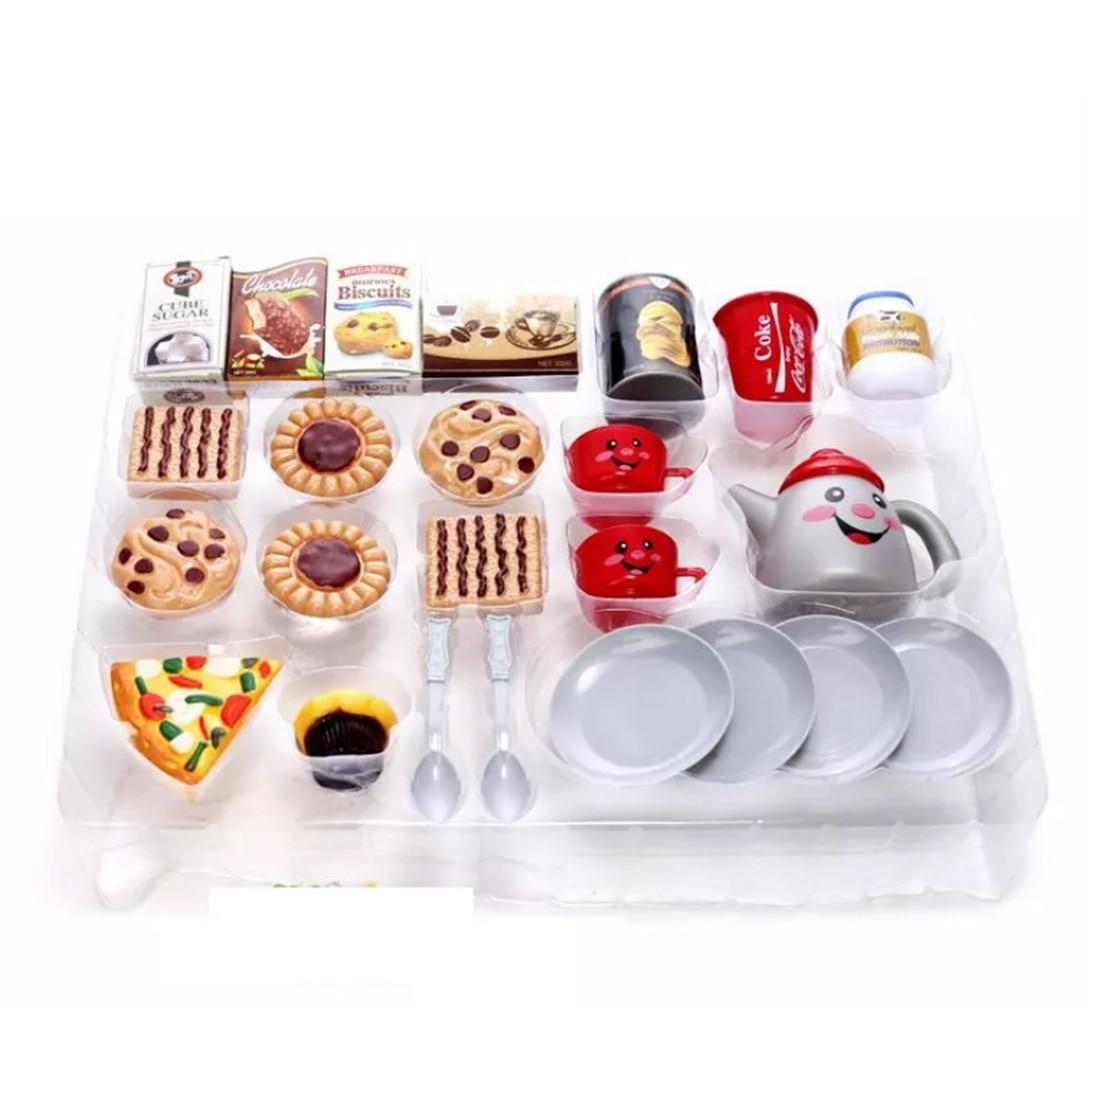 Afternoon Tea Dessert Toy Set Pretend & Play Children Home Educational Toy